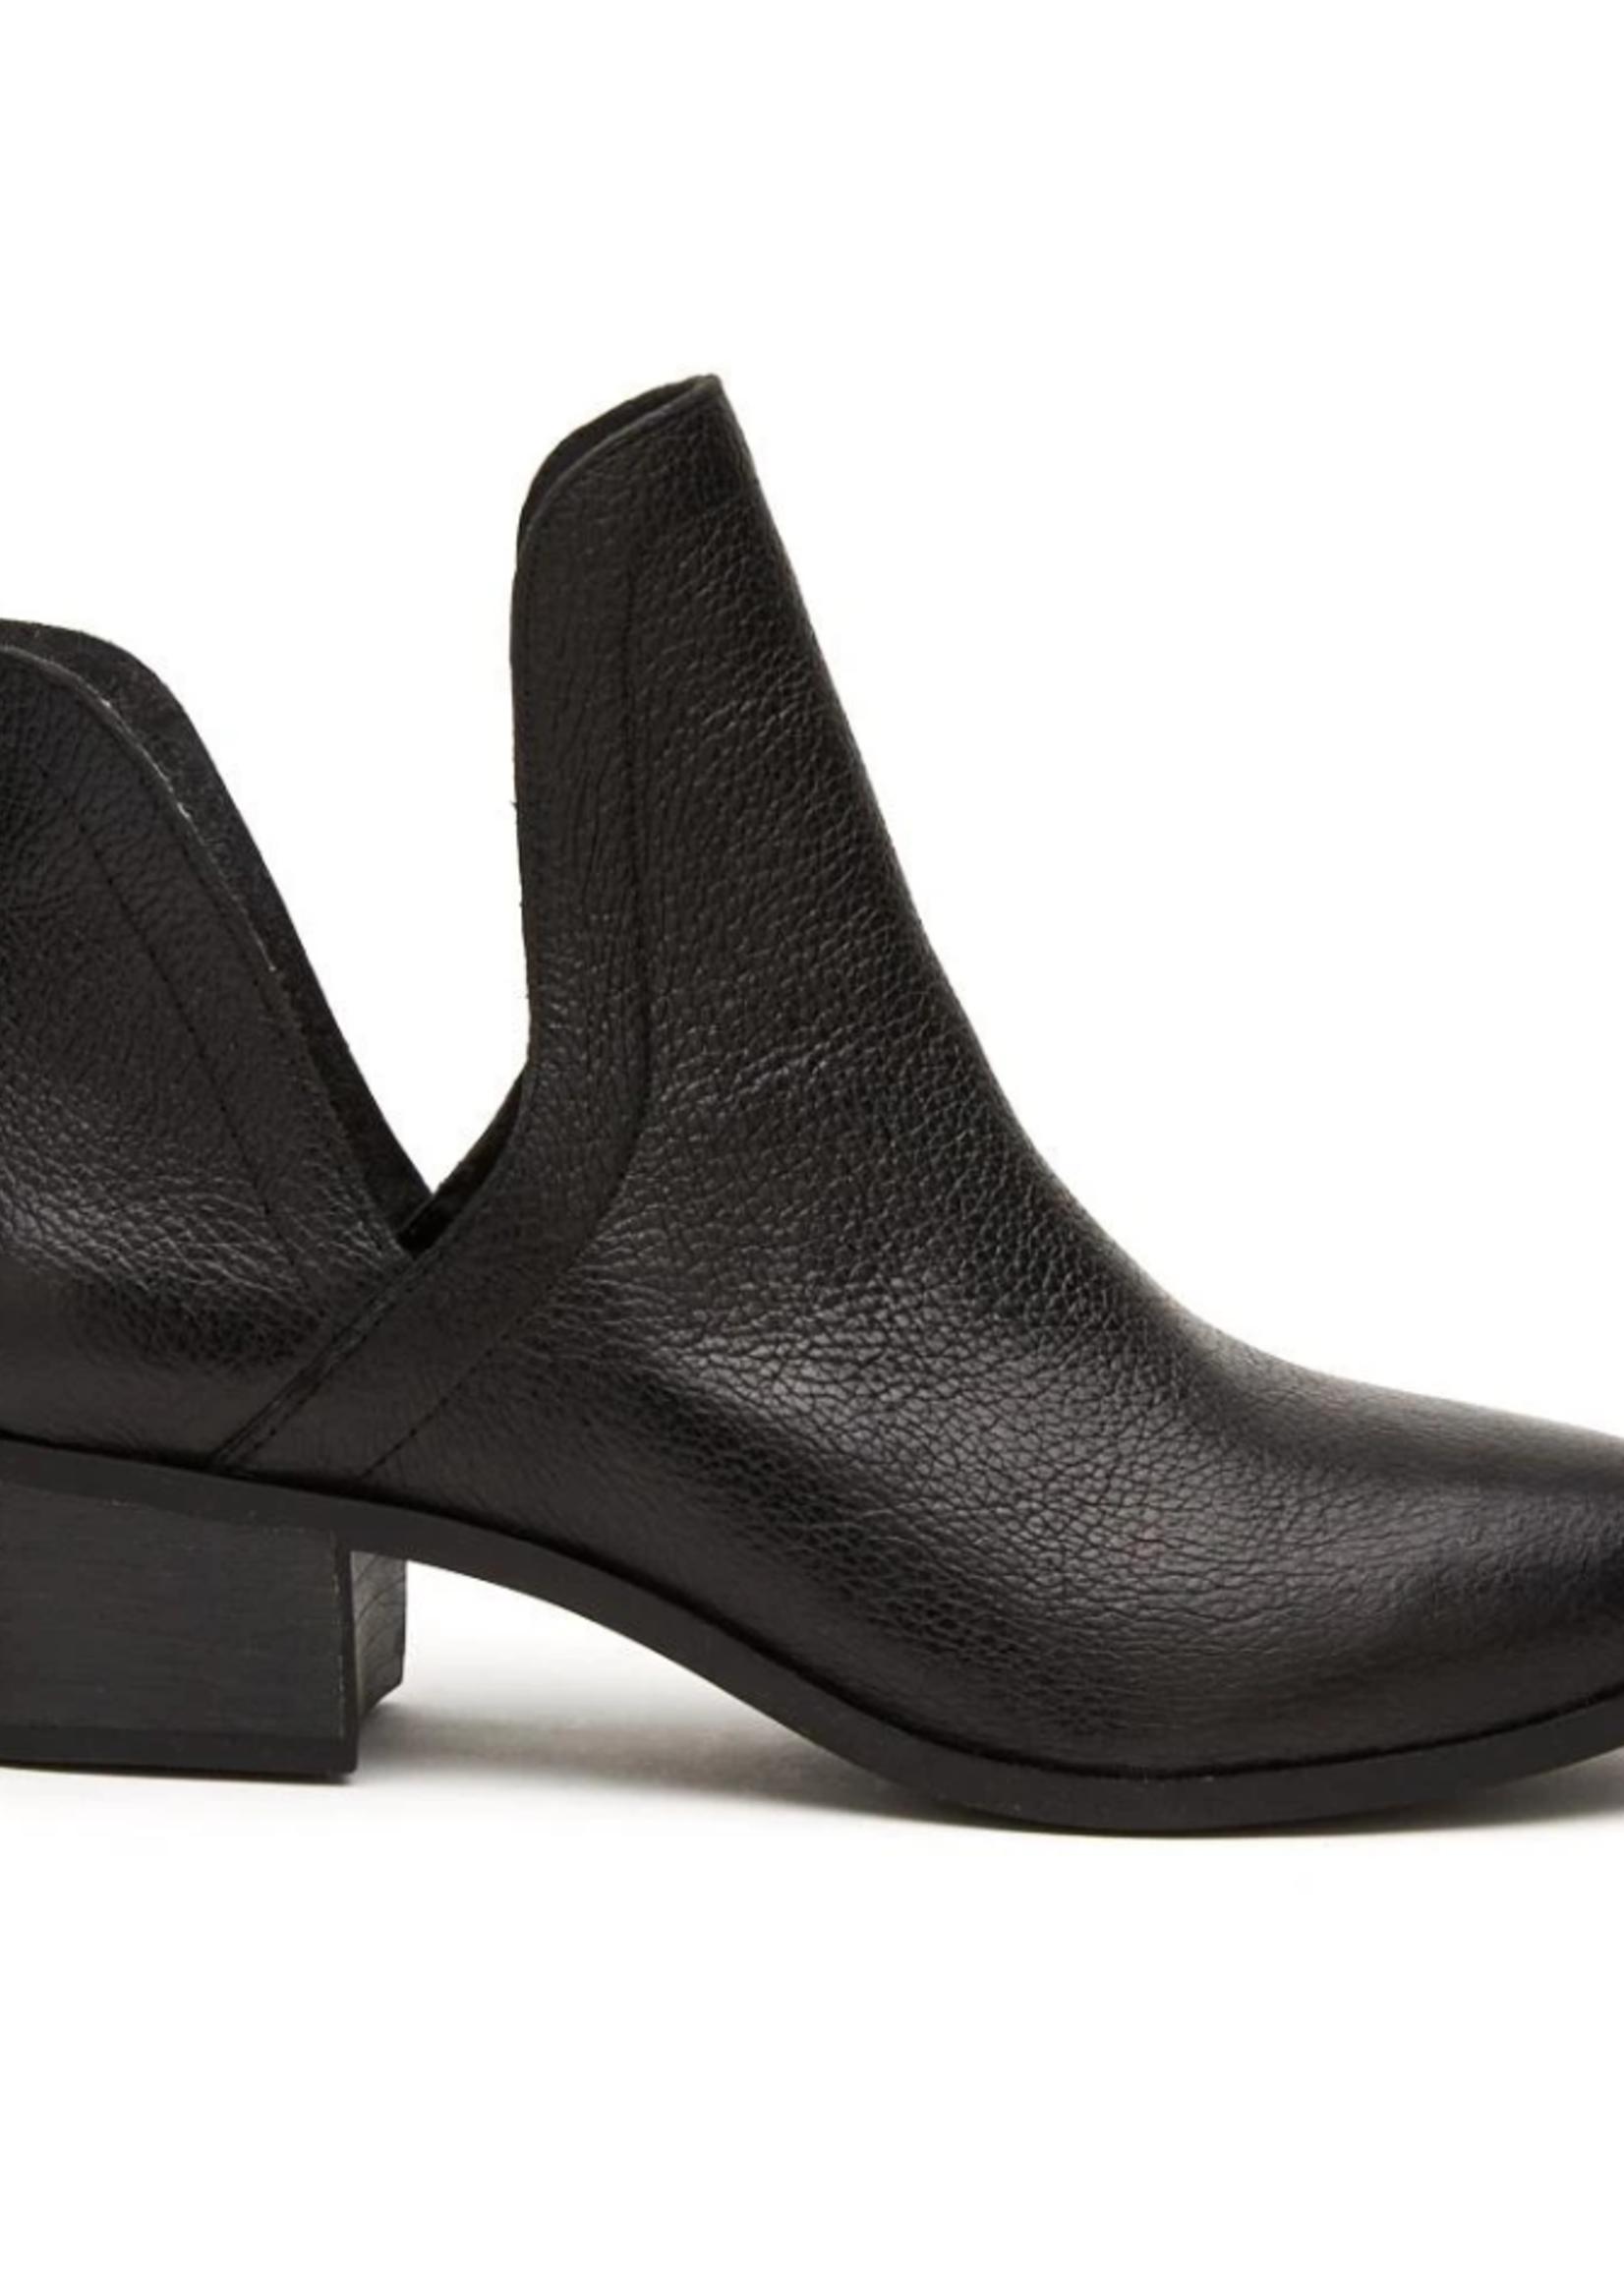 Matisse Pronto - Black Leather